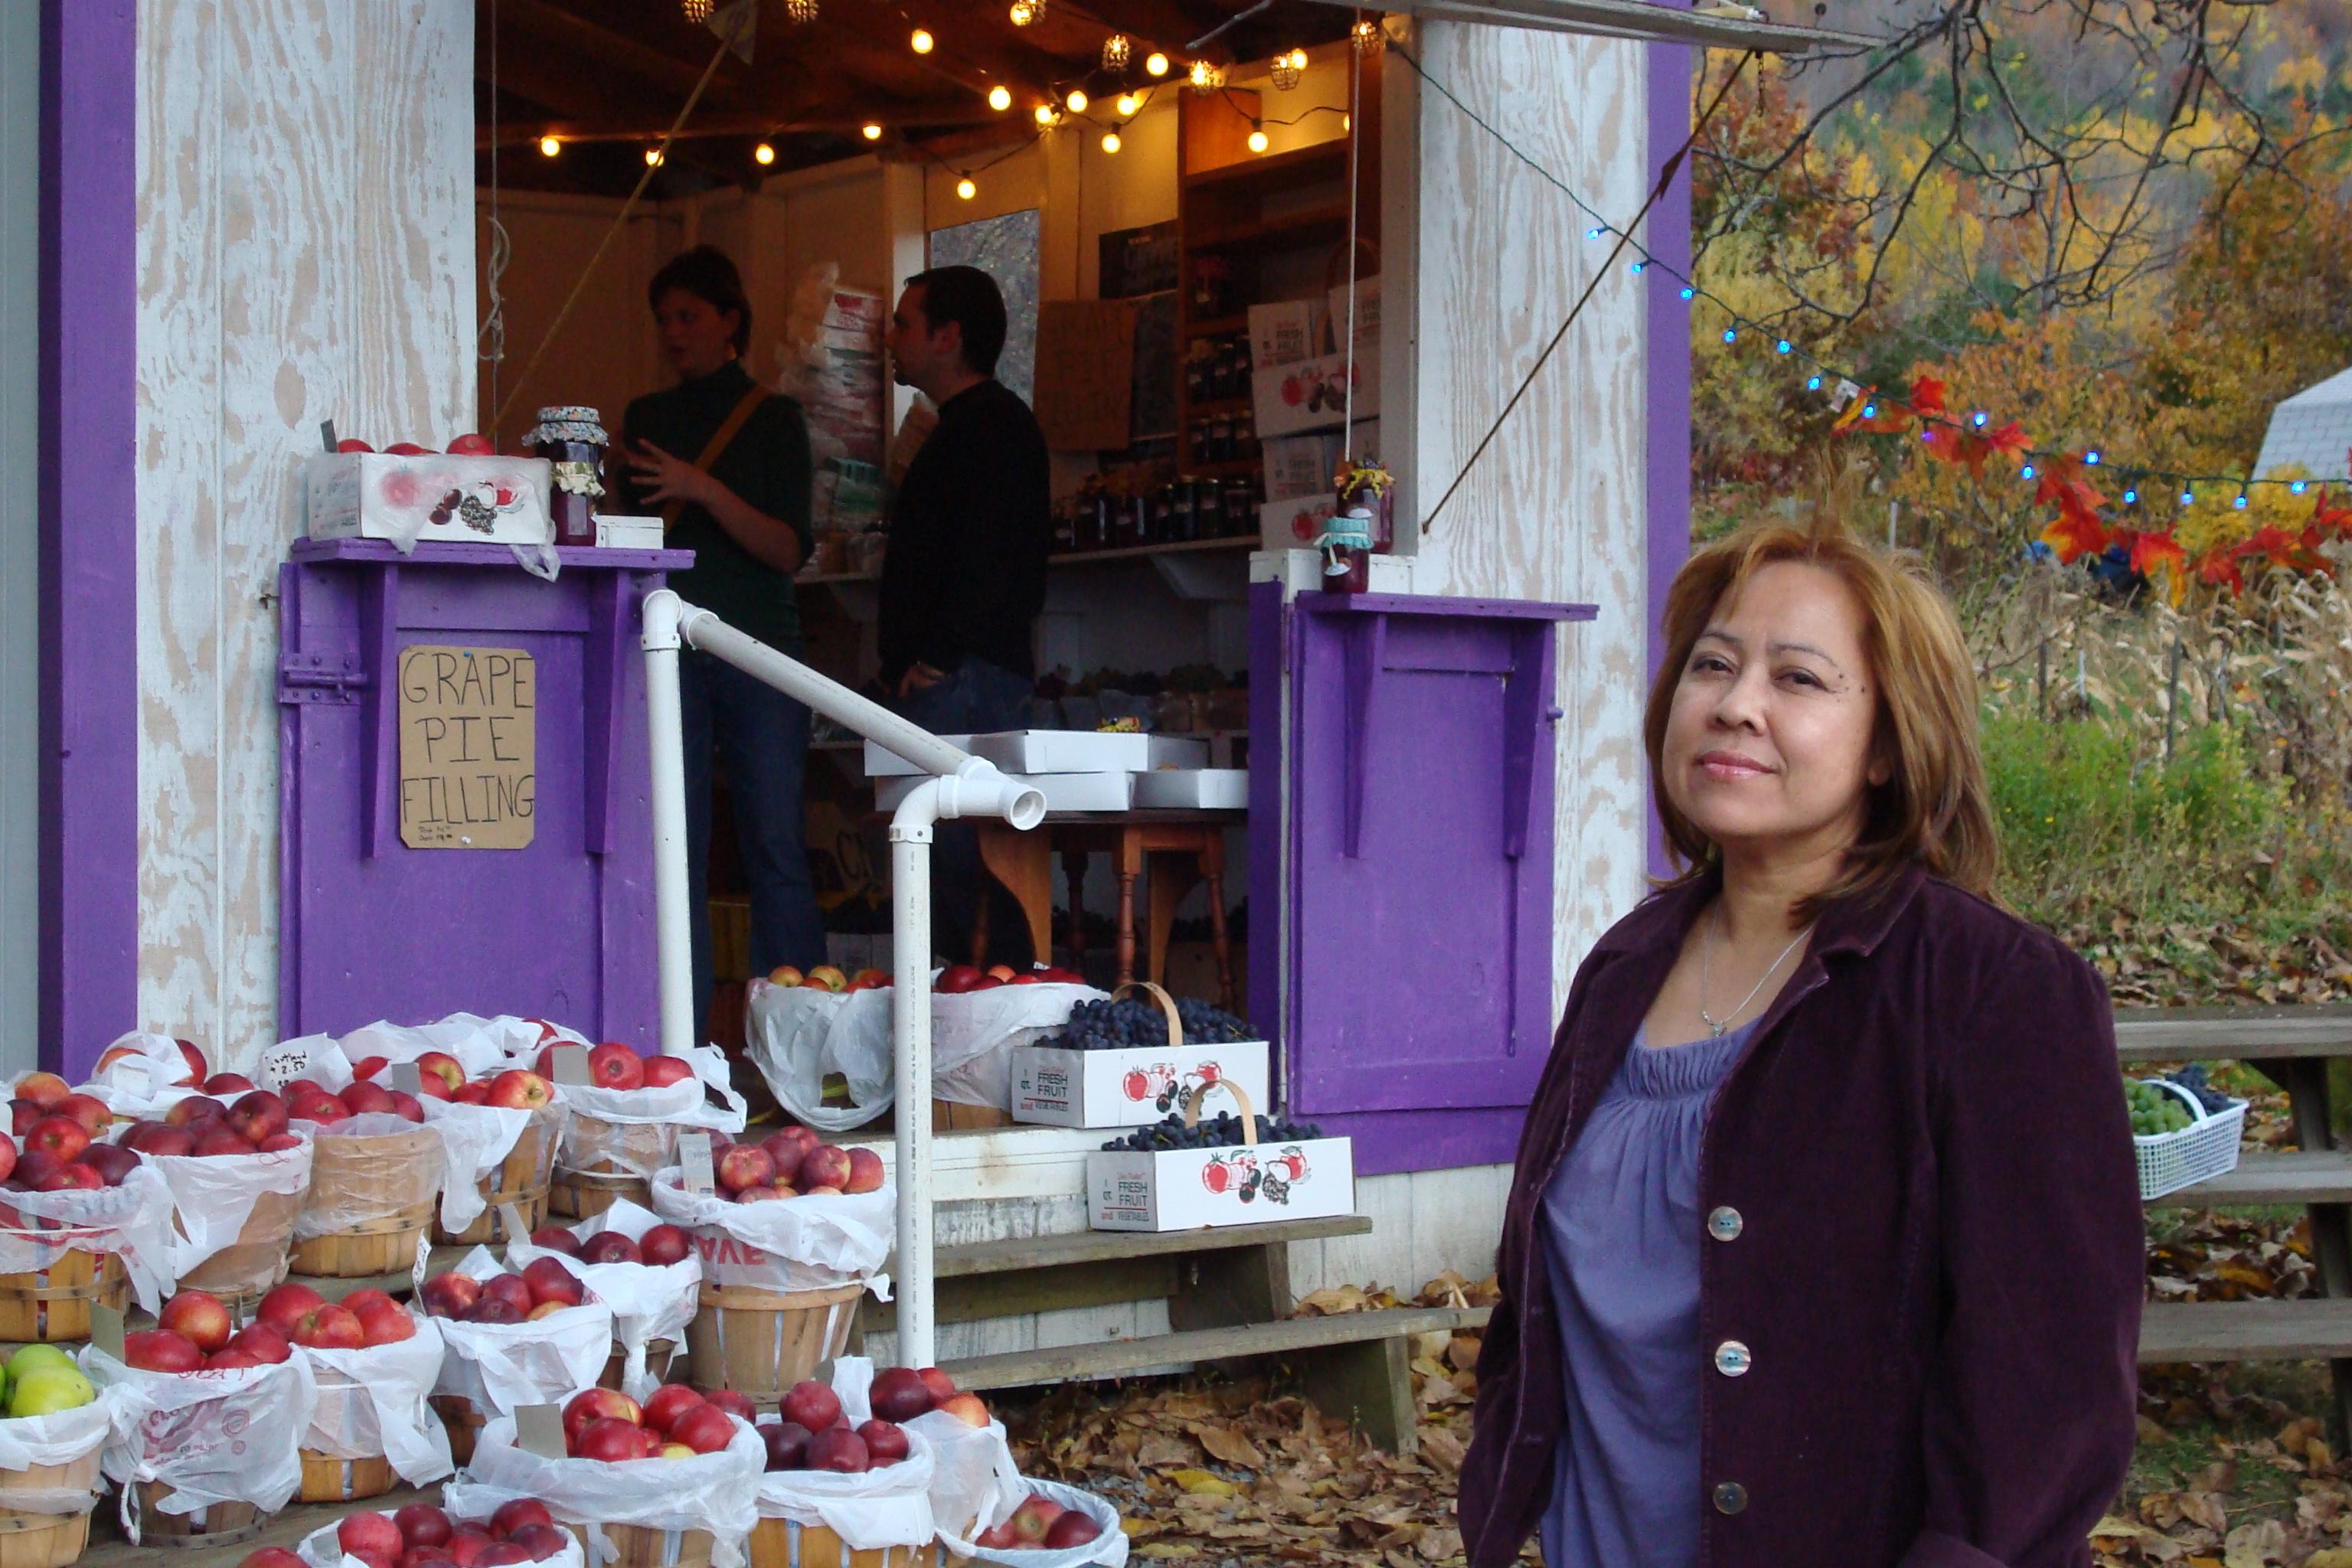 Fruit stand Naples, NY